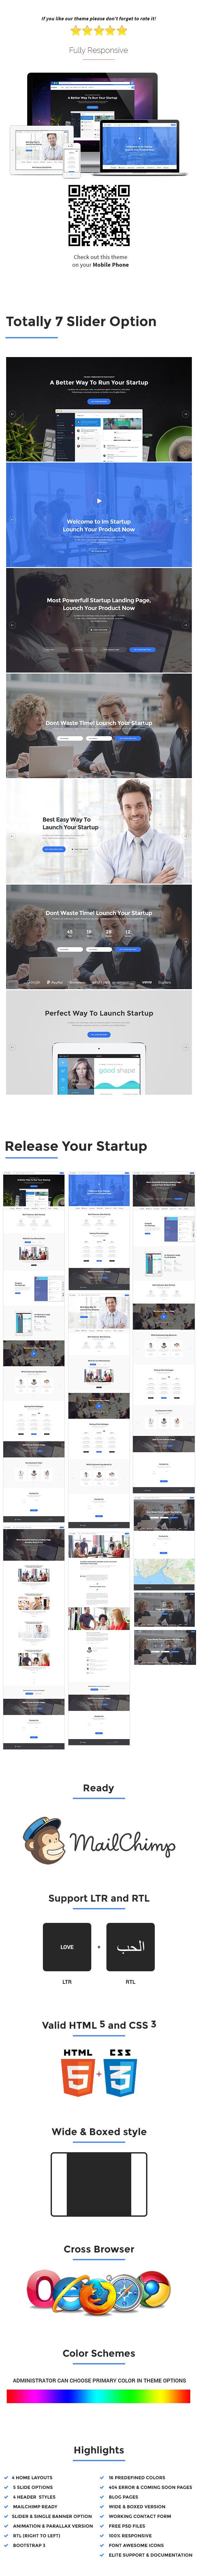 ImStartup - Startup Landing Page WordPress Theme - 1